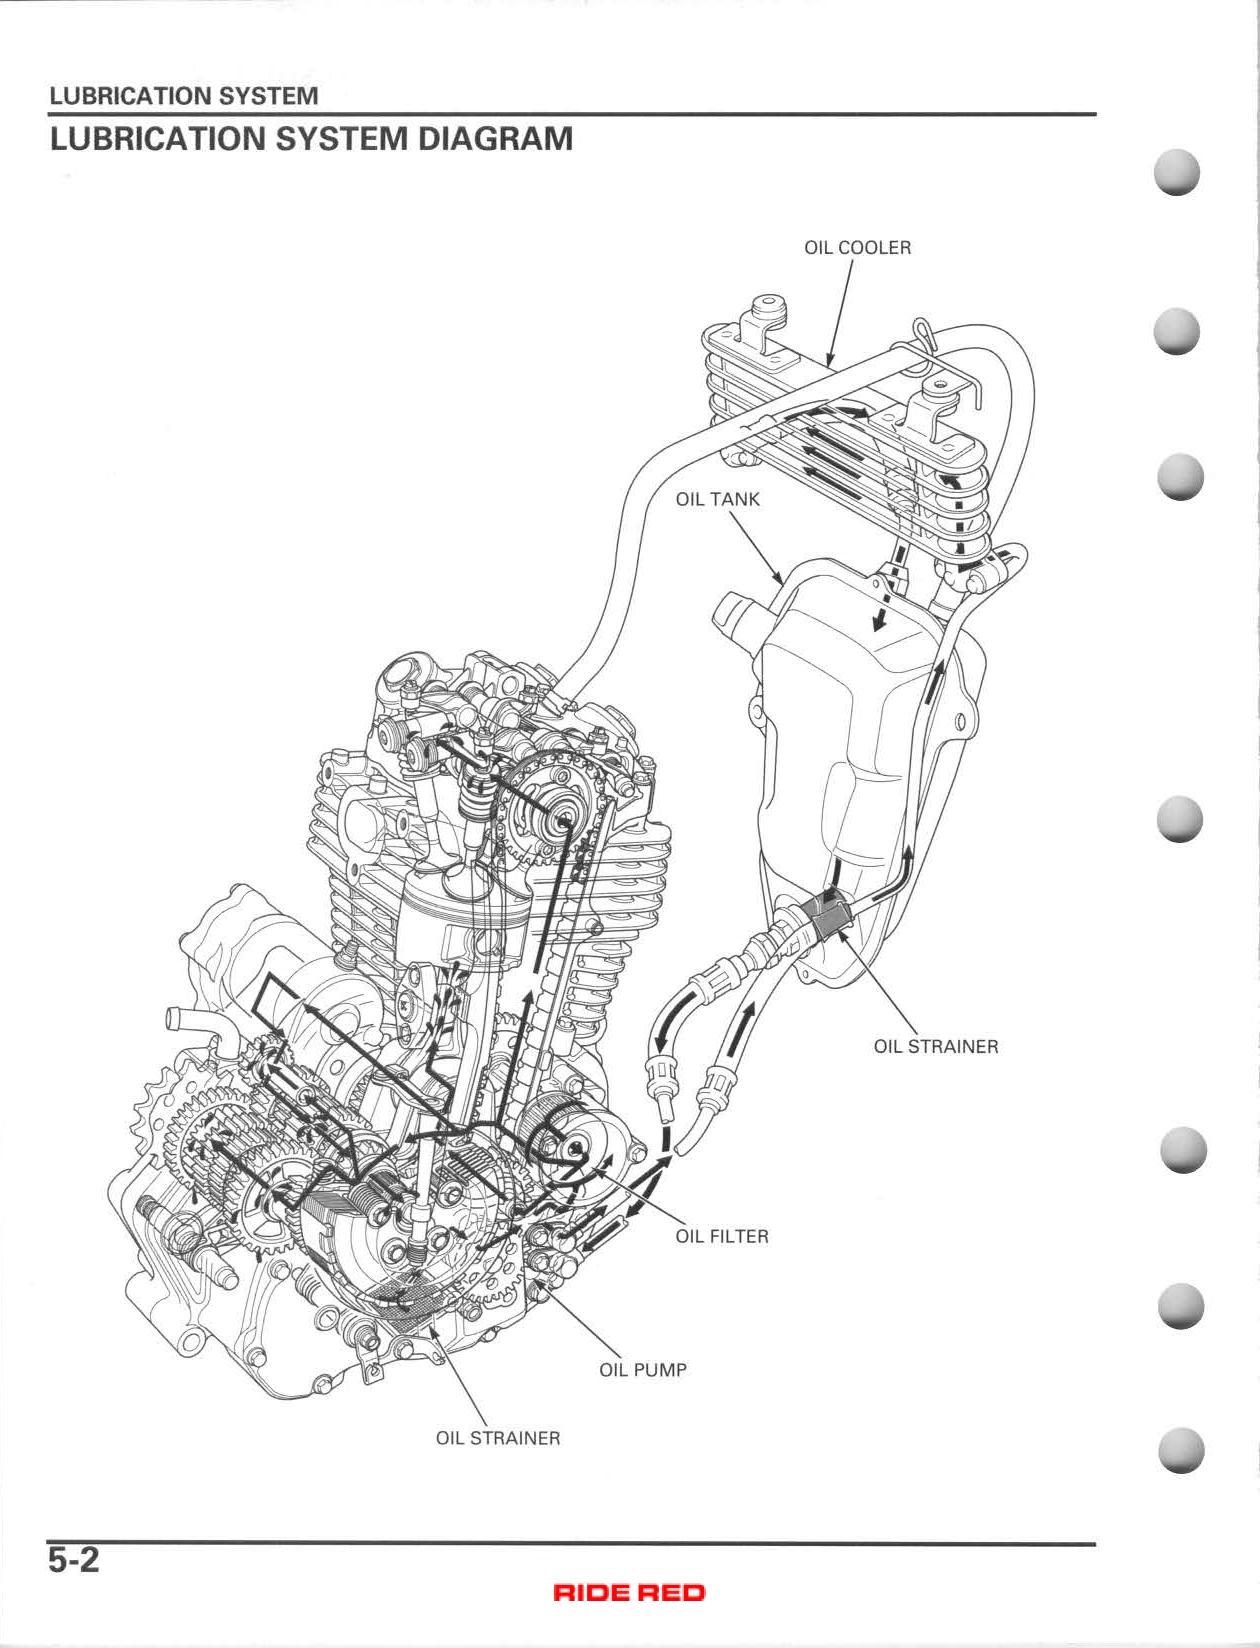 Honda 400ex Engine Diagram - wiring diagram cycle-tech -  cycle-tech.rilievo3d.it | Trx 400ex Wiring Diagram |  | rilievo3d.it